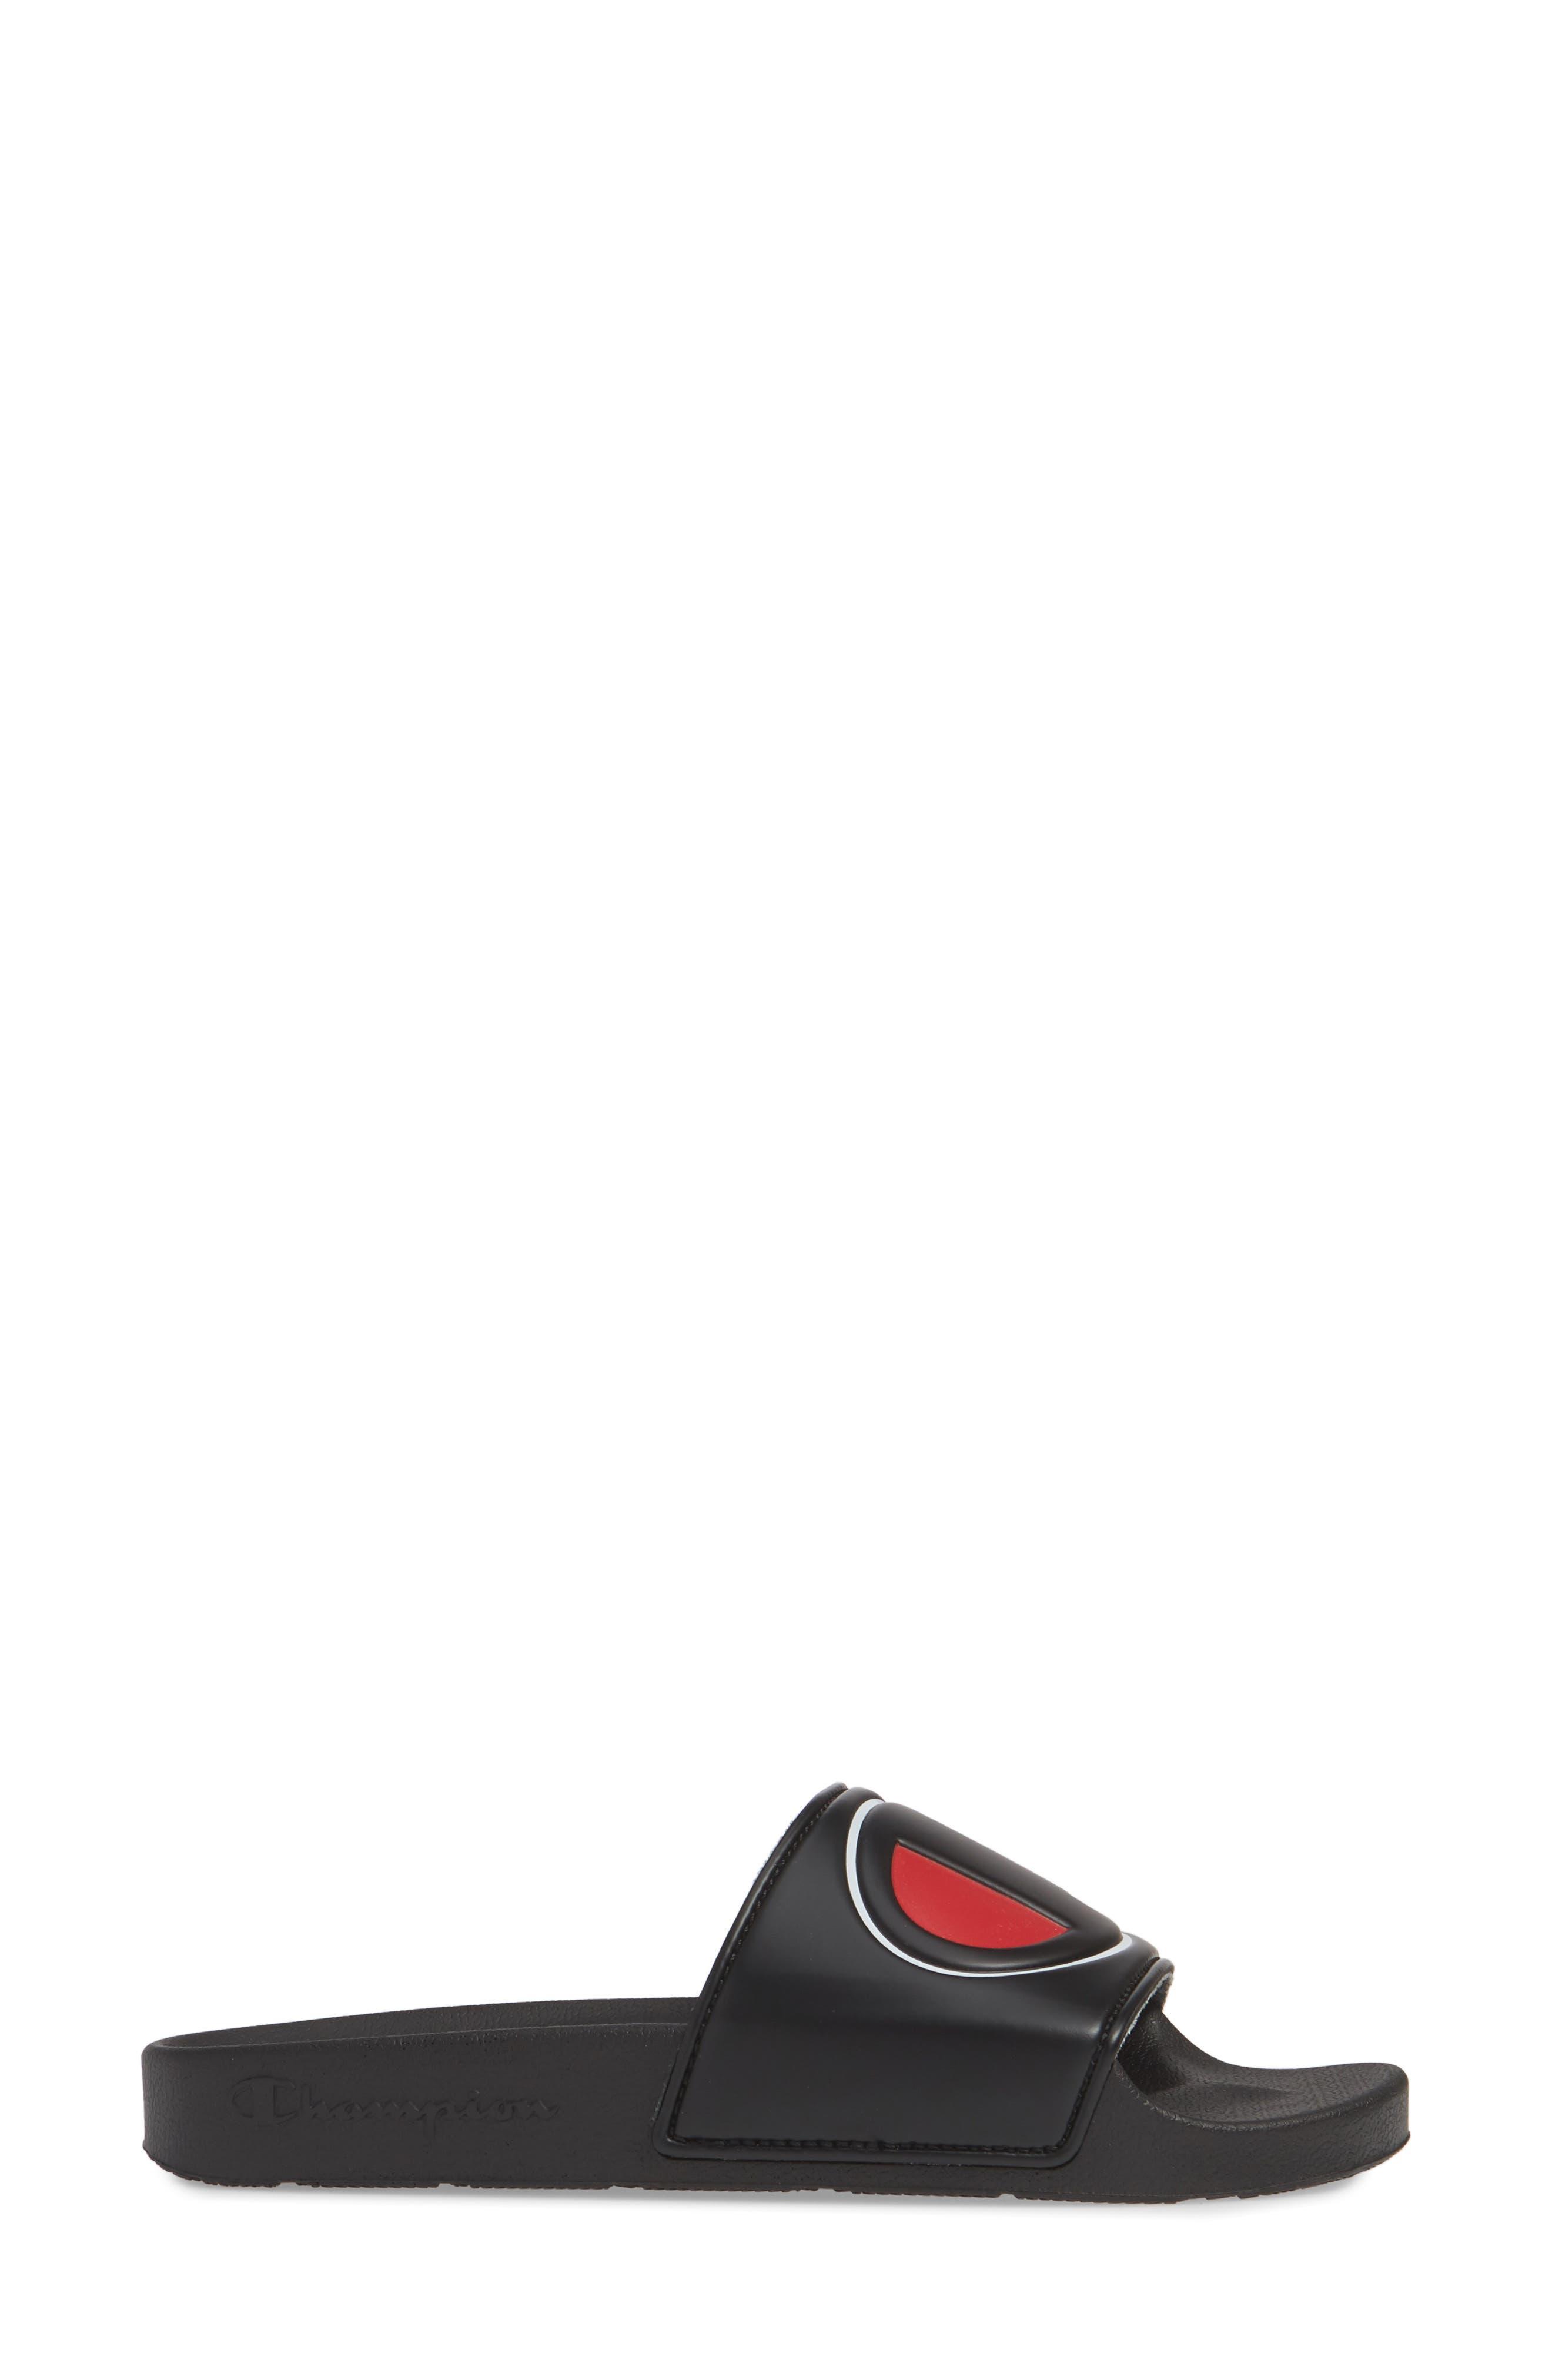 CHAMPION, Slide Sandal, Alternate thumbnail 3, color, BLACK